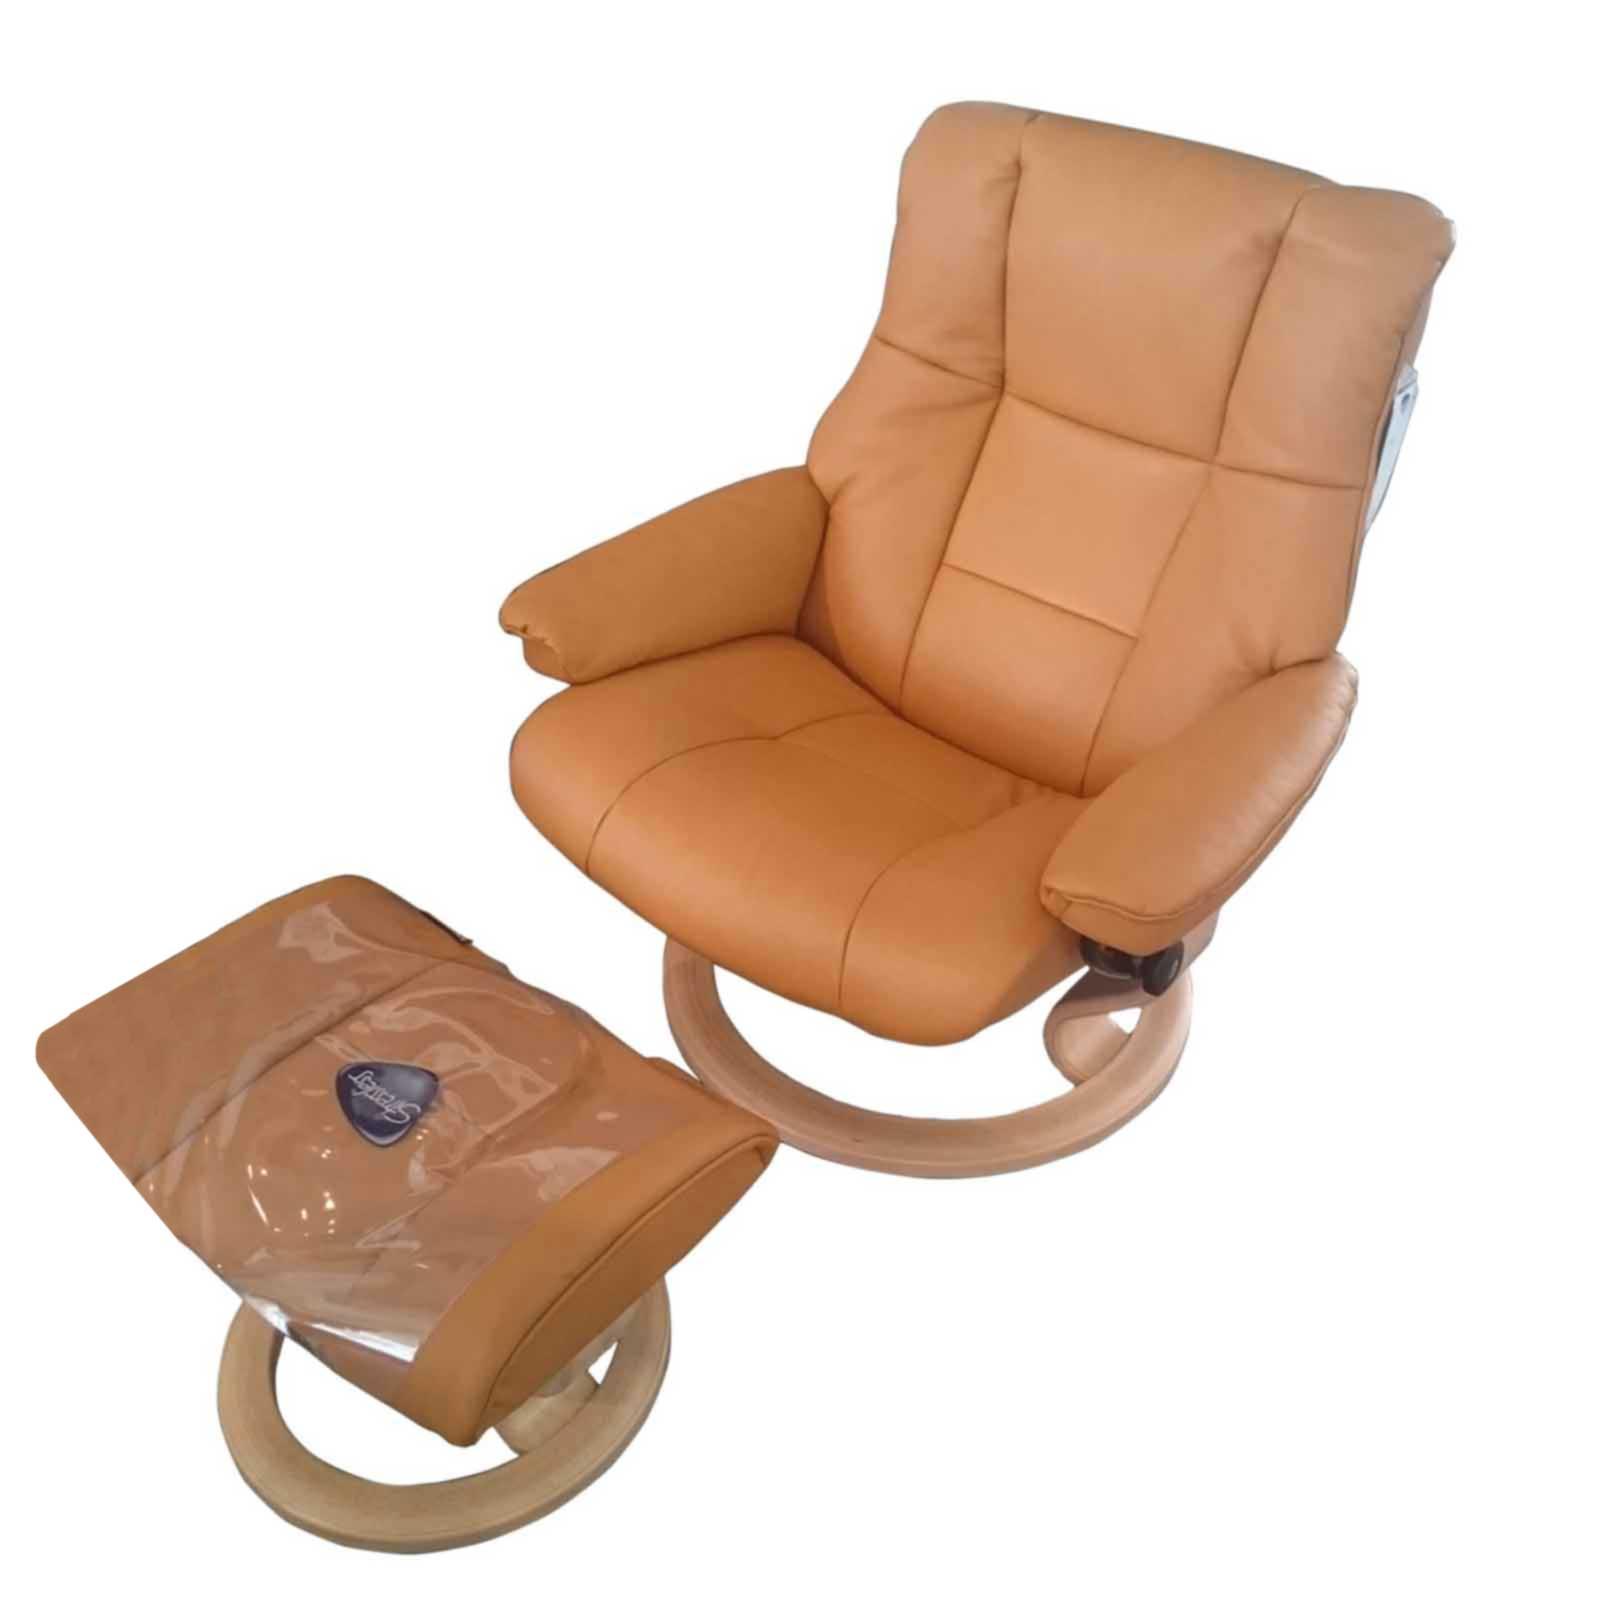 angebot stressless sessel mayfair leder cori tan mit hocker. Black Bedroom Furniture Sets. Home Design Ideas